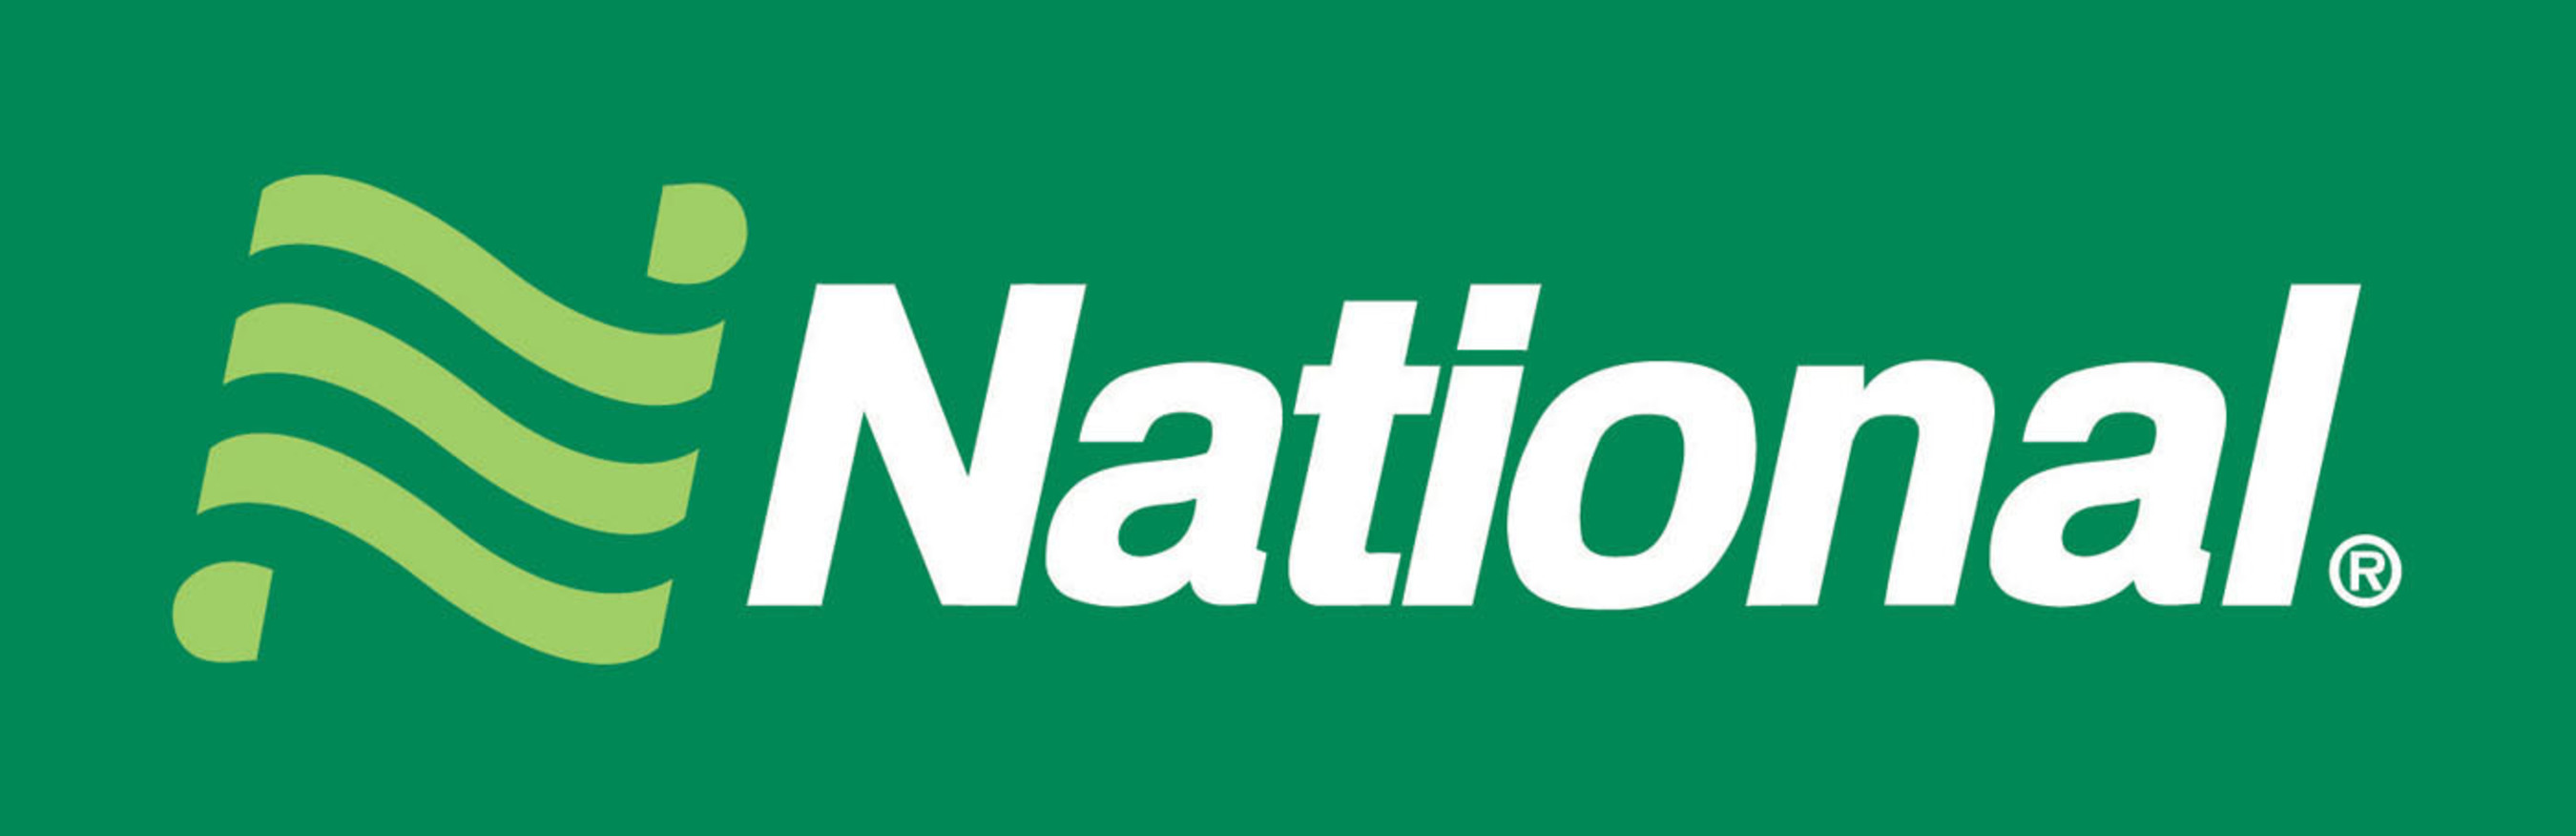 National Car Rental Logo.